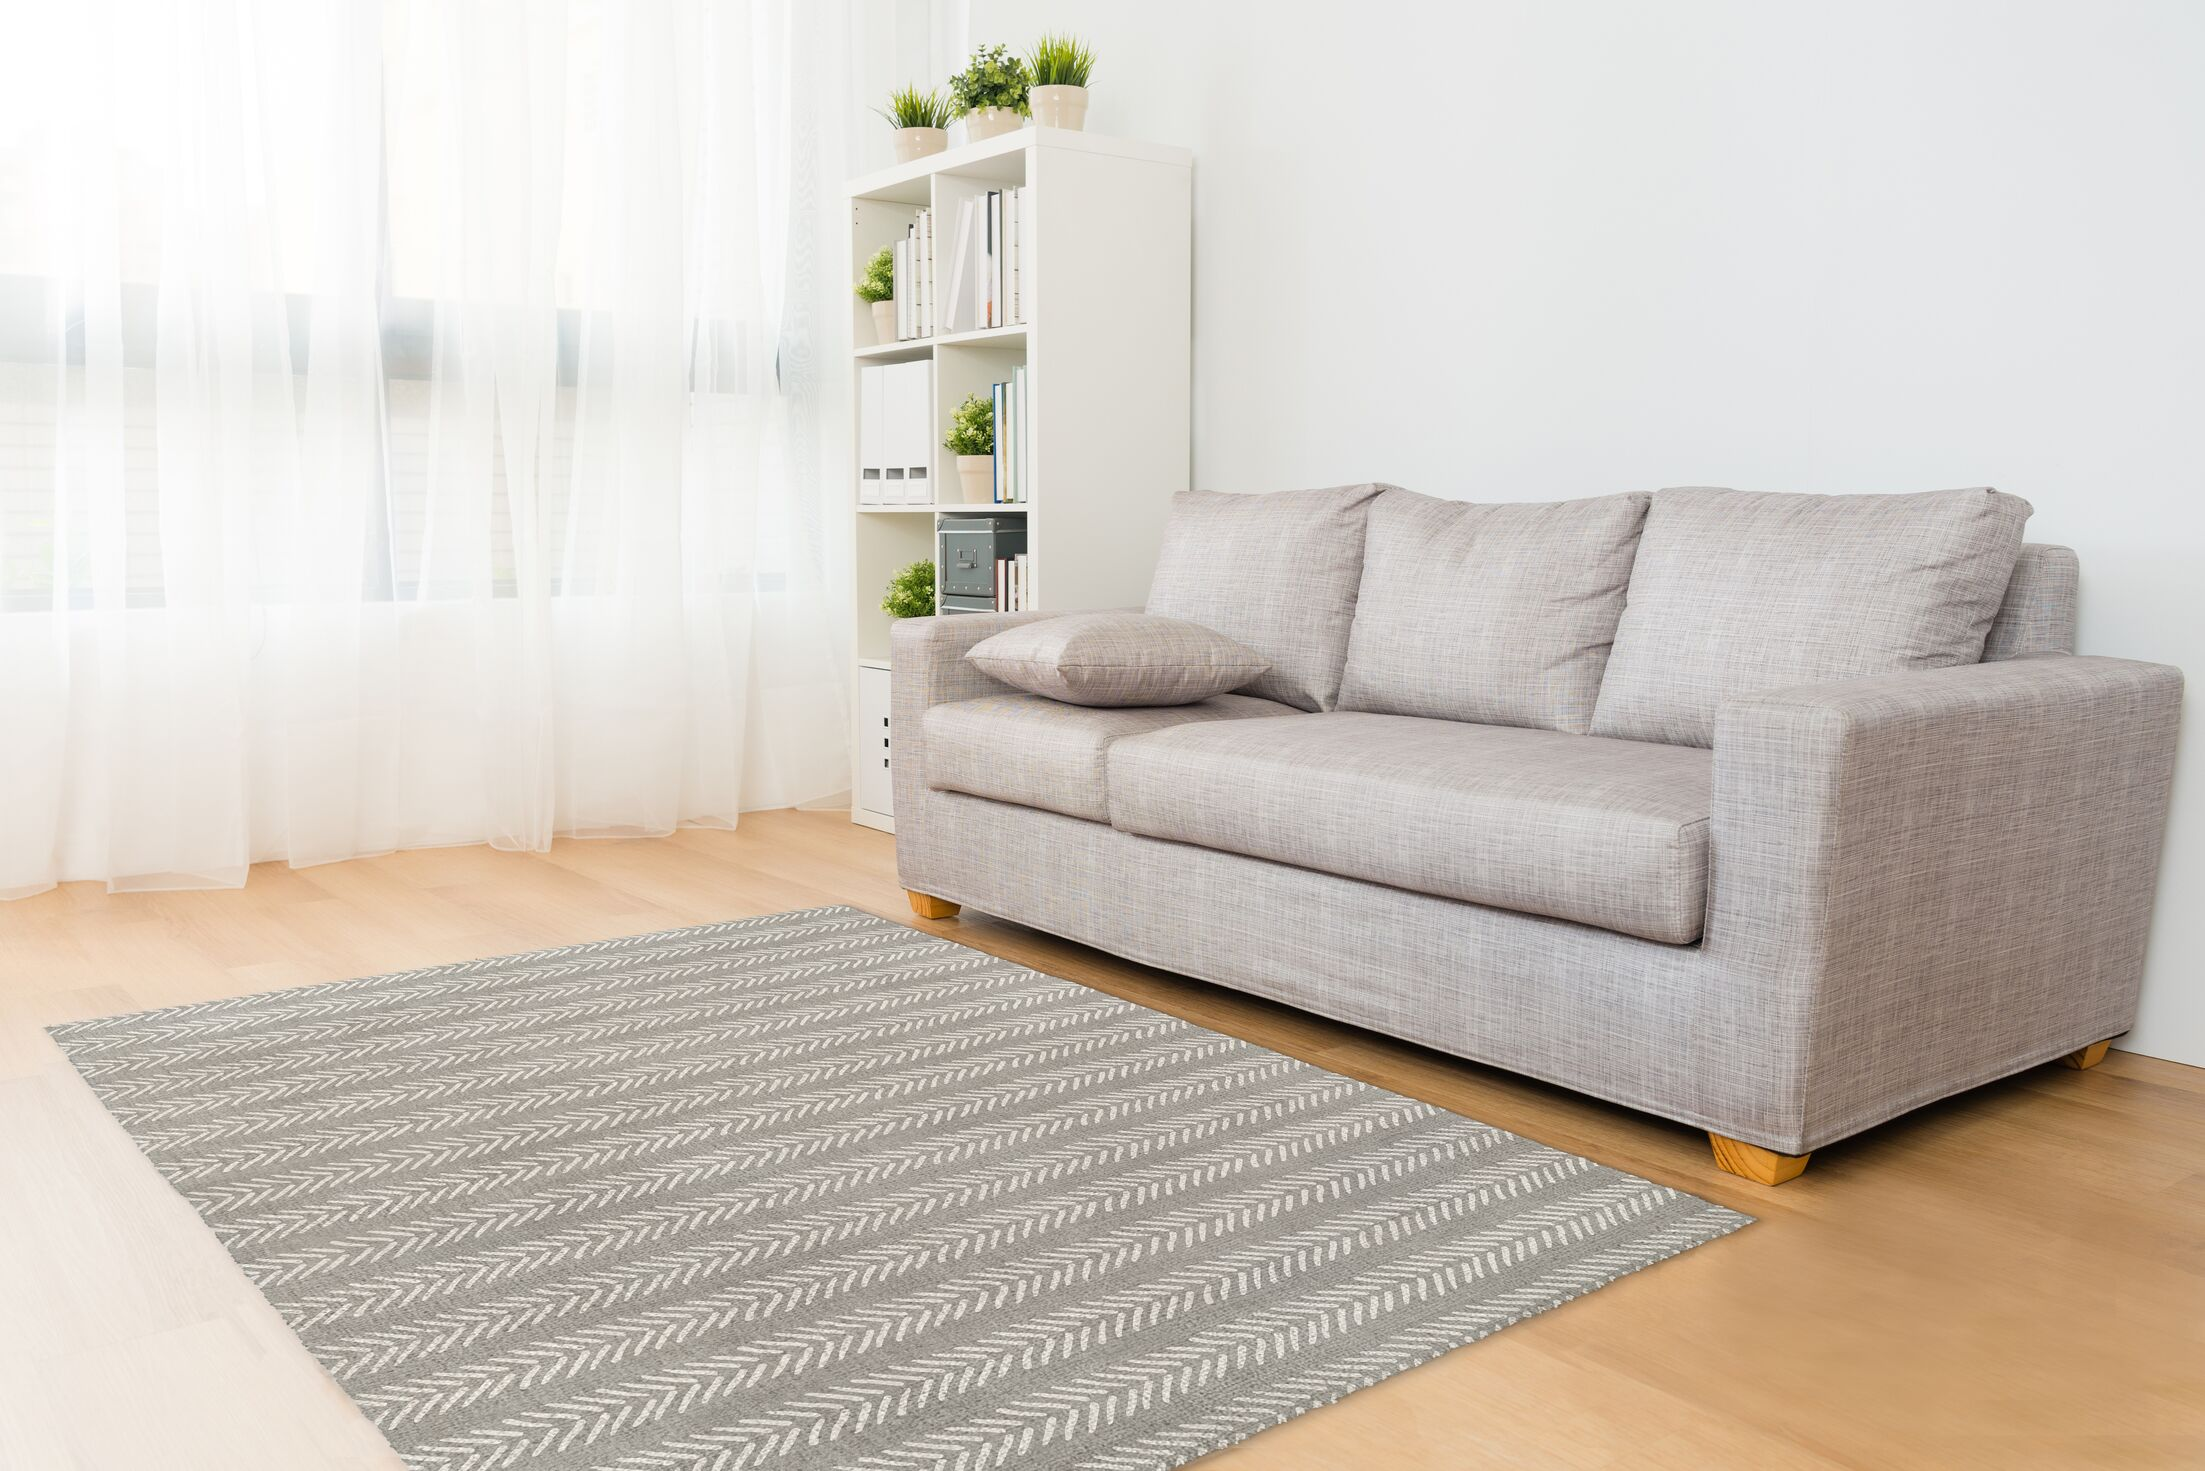 Gray Area Rug Rug Size: Rectangle 8' x 10'